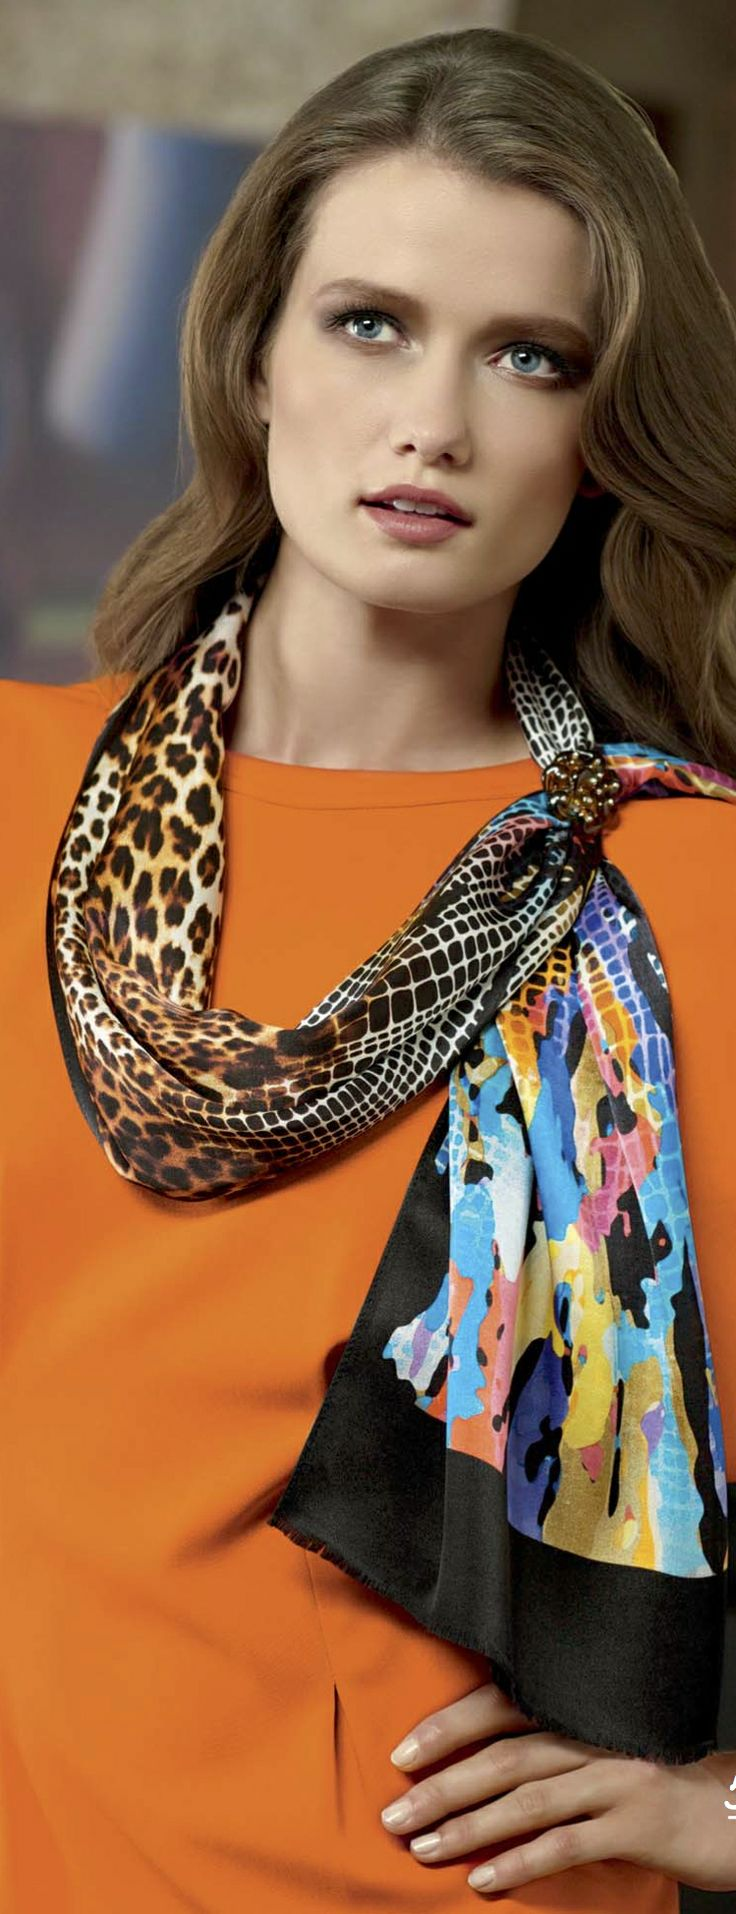 Aker Eşarp / Scarf - 2011-12 F/W #aker #scarf #esarp #hijab #fashion #silk #scarves #moda #hijab #tesettur #model #mode #style #pattern #babushka #kerchief #shawl #wrapper #trend #aker #akeresarp #akerscarf